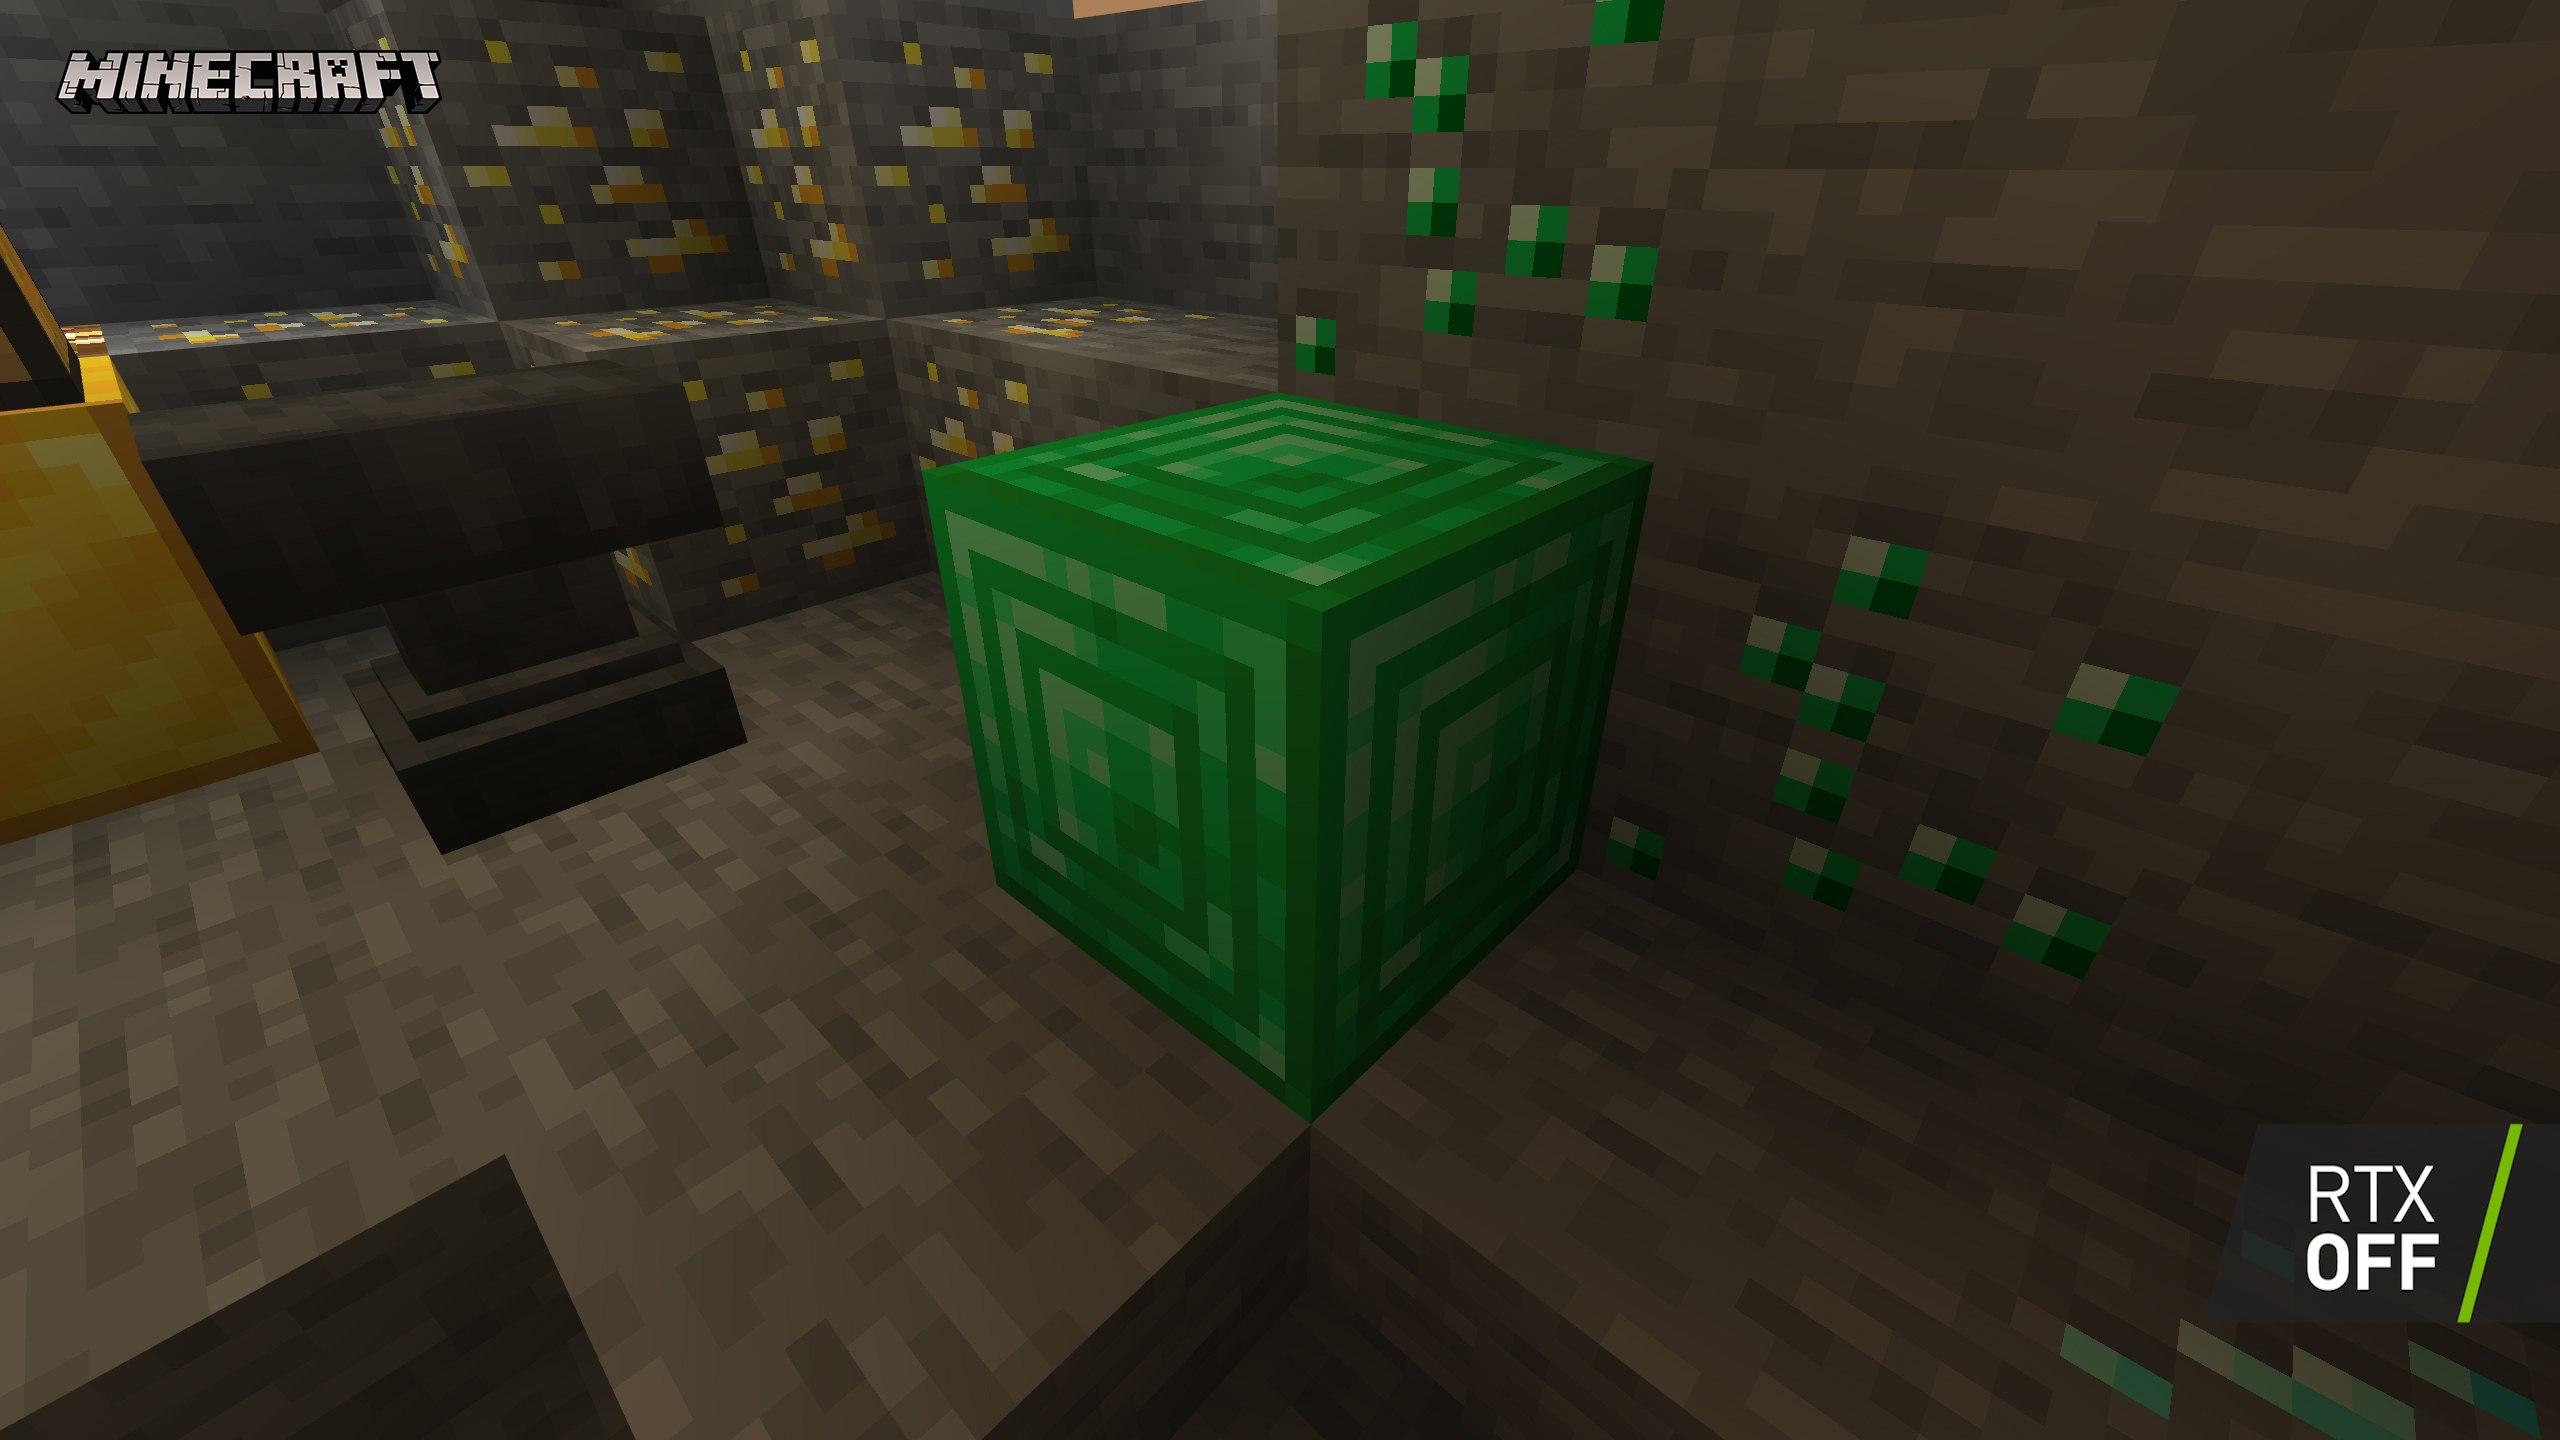 minecraft with rtx beta crystal palace emissive blocks 001 rtx off